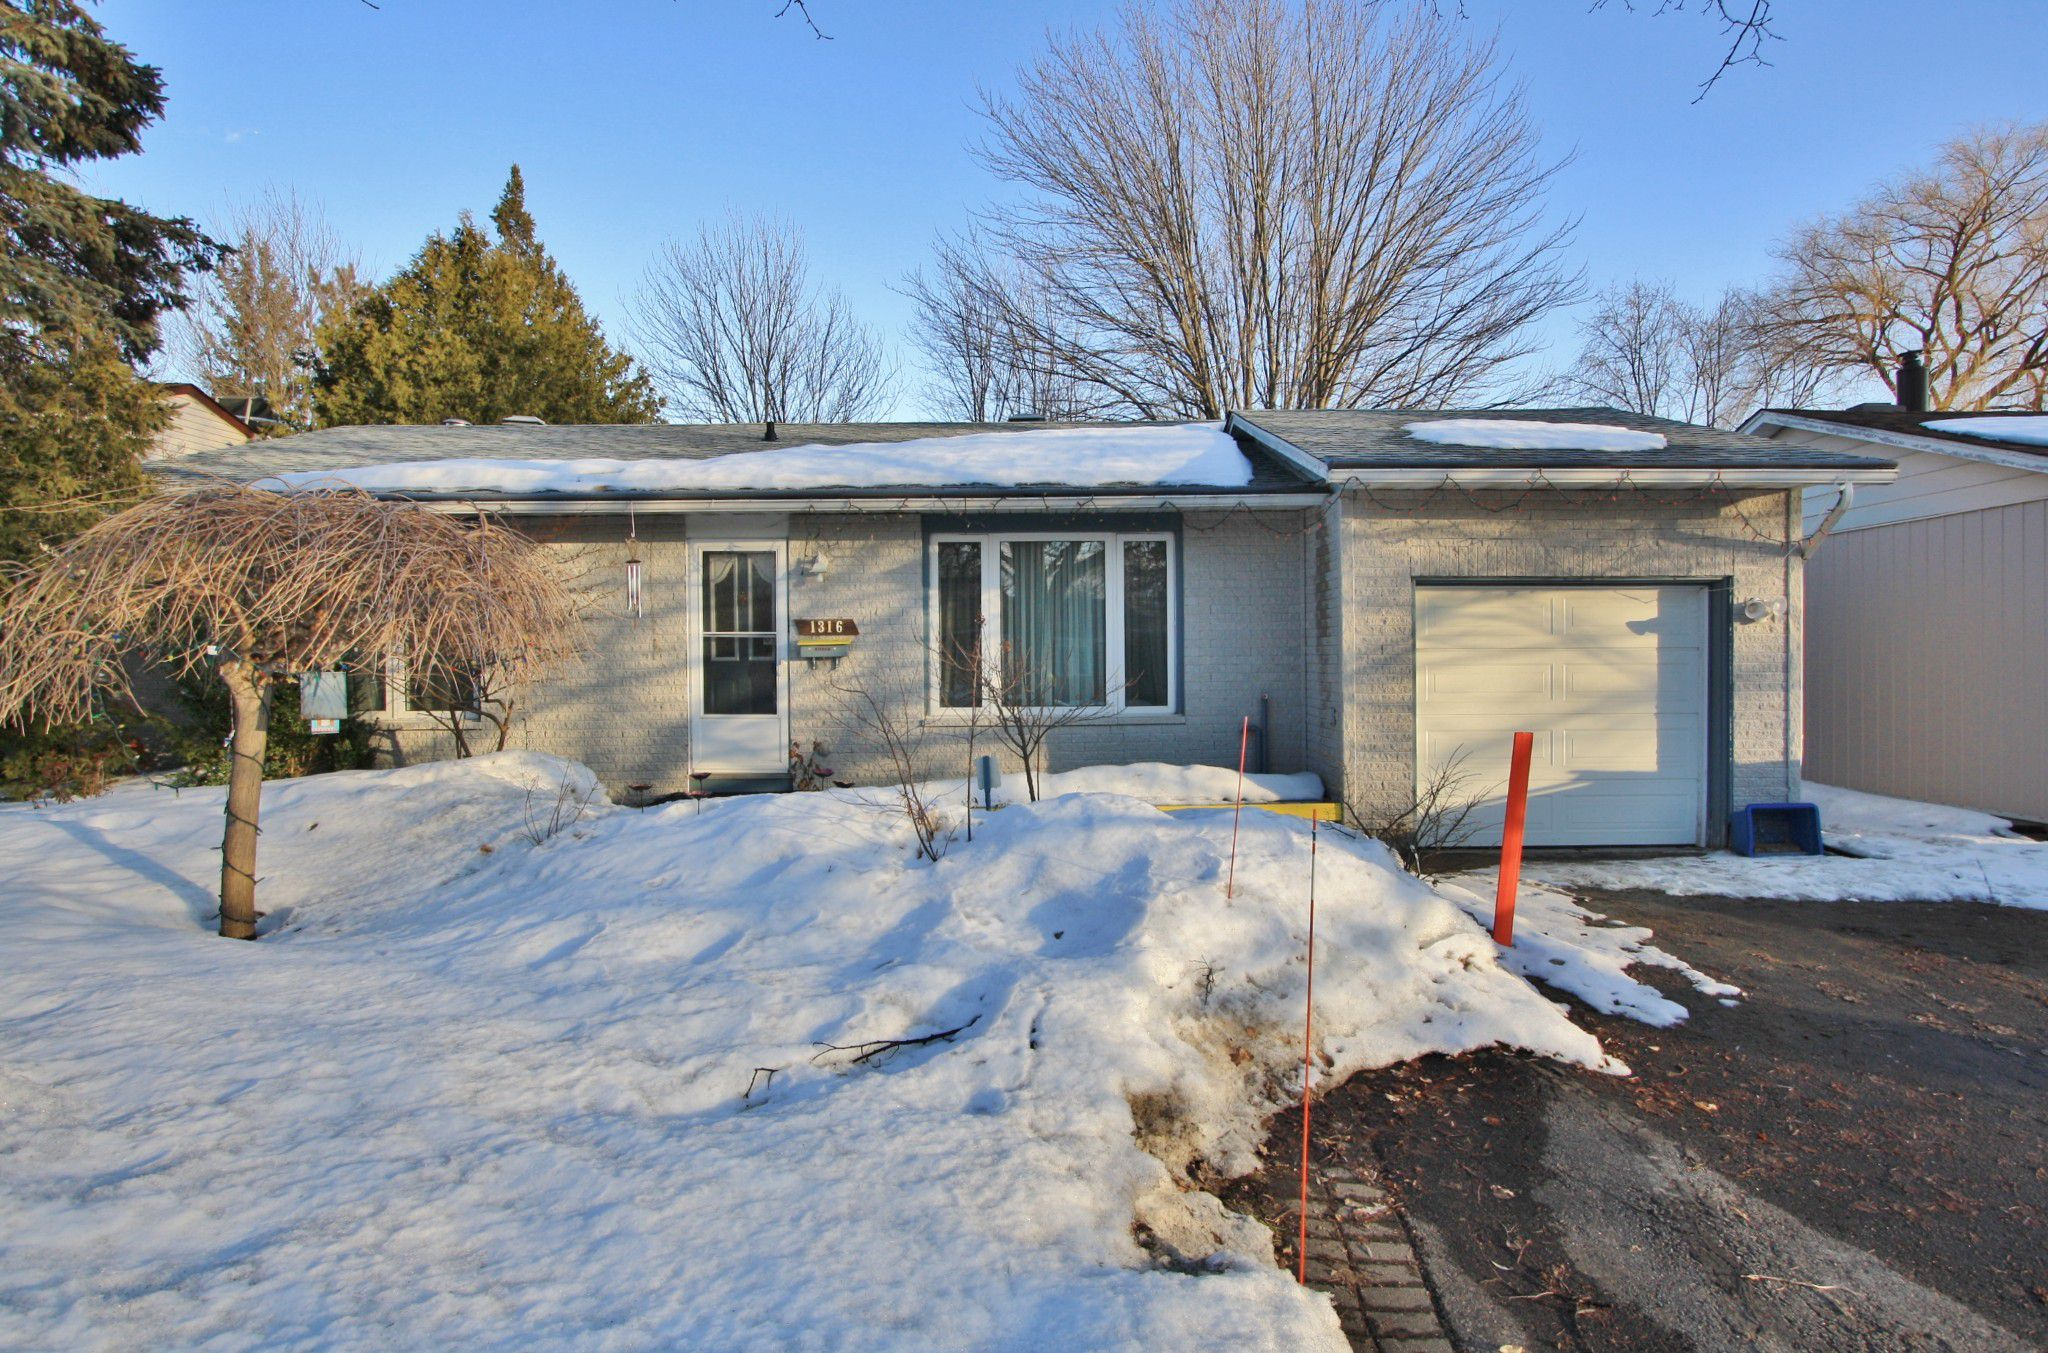 Main Photo: 1316 Alloway Crescent in Ottawa: House for sale (Carson Grove)